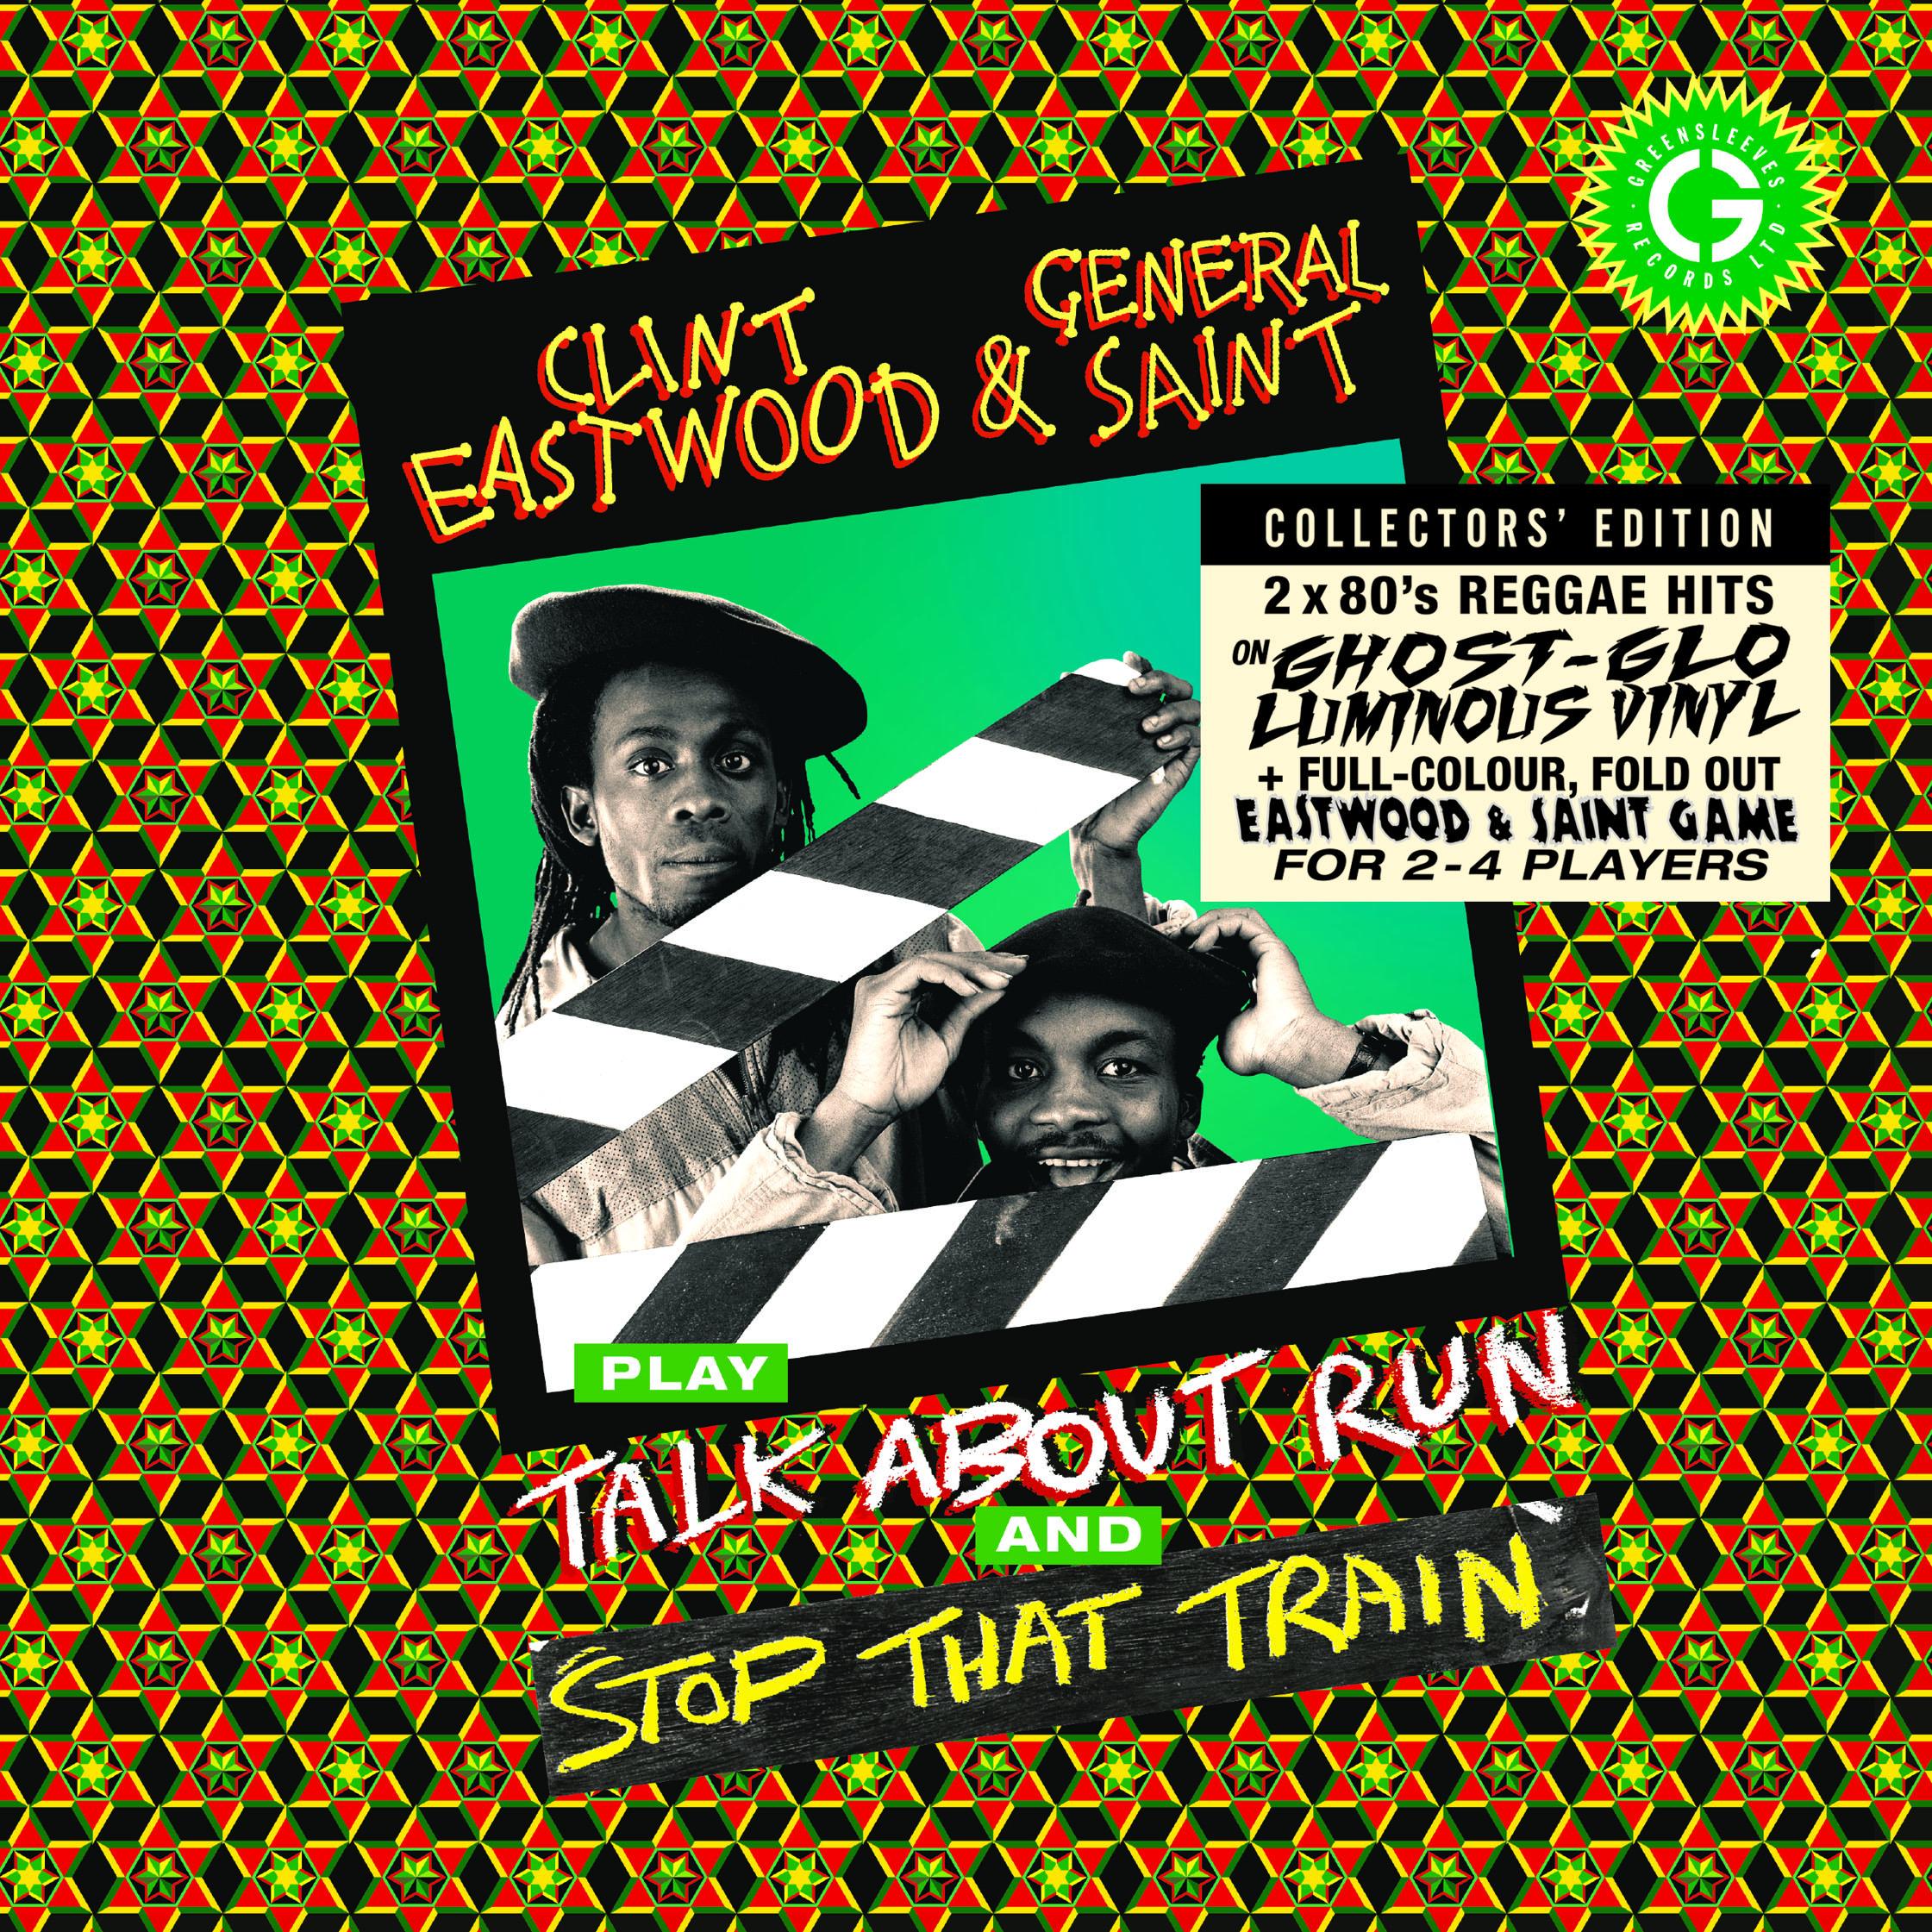 Clint Eastwood & General Saint - Stop That Train / Stop That Train b/w Talk About Run